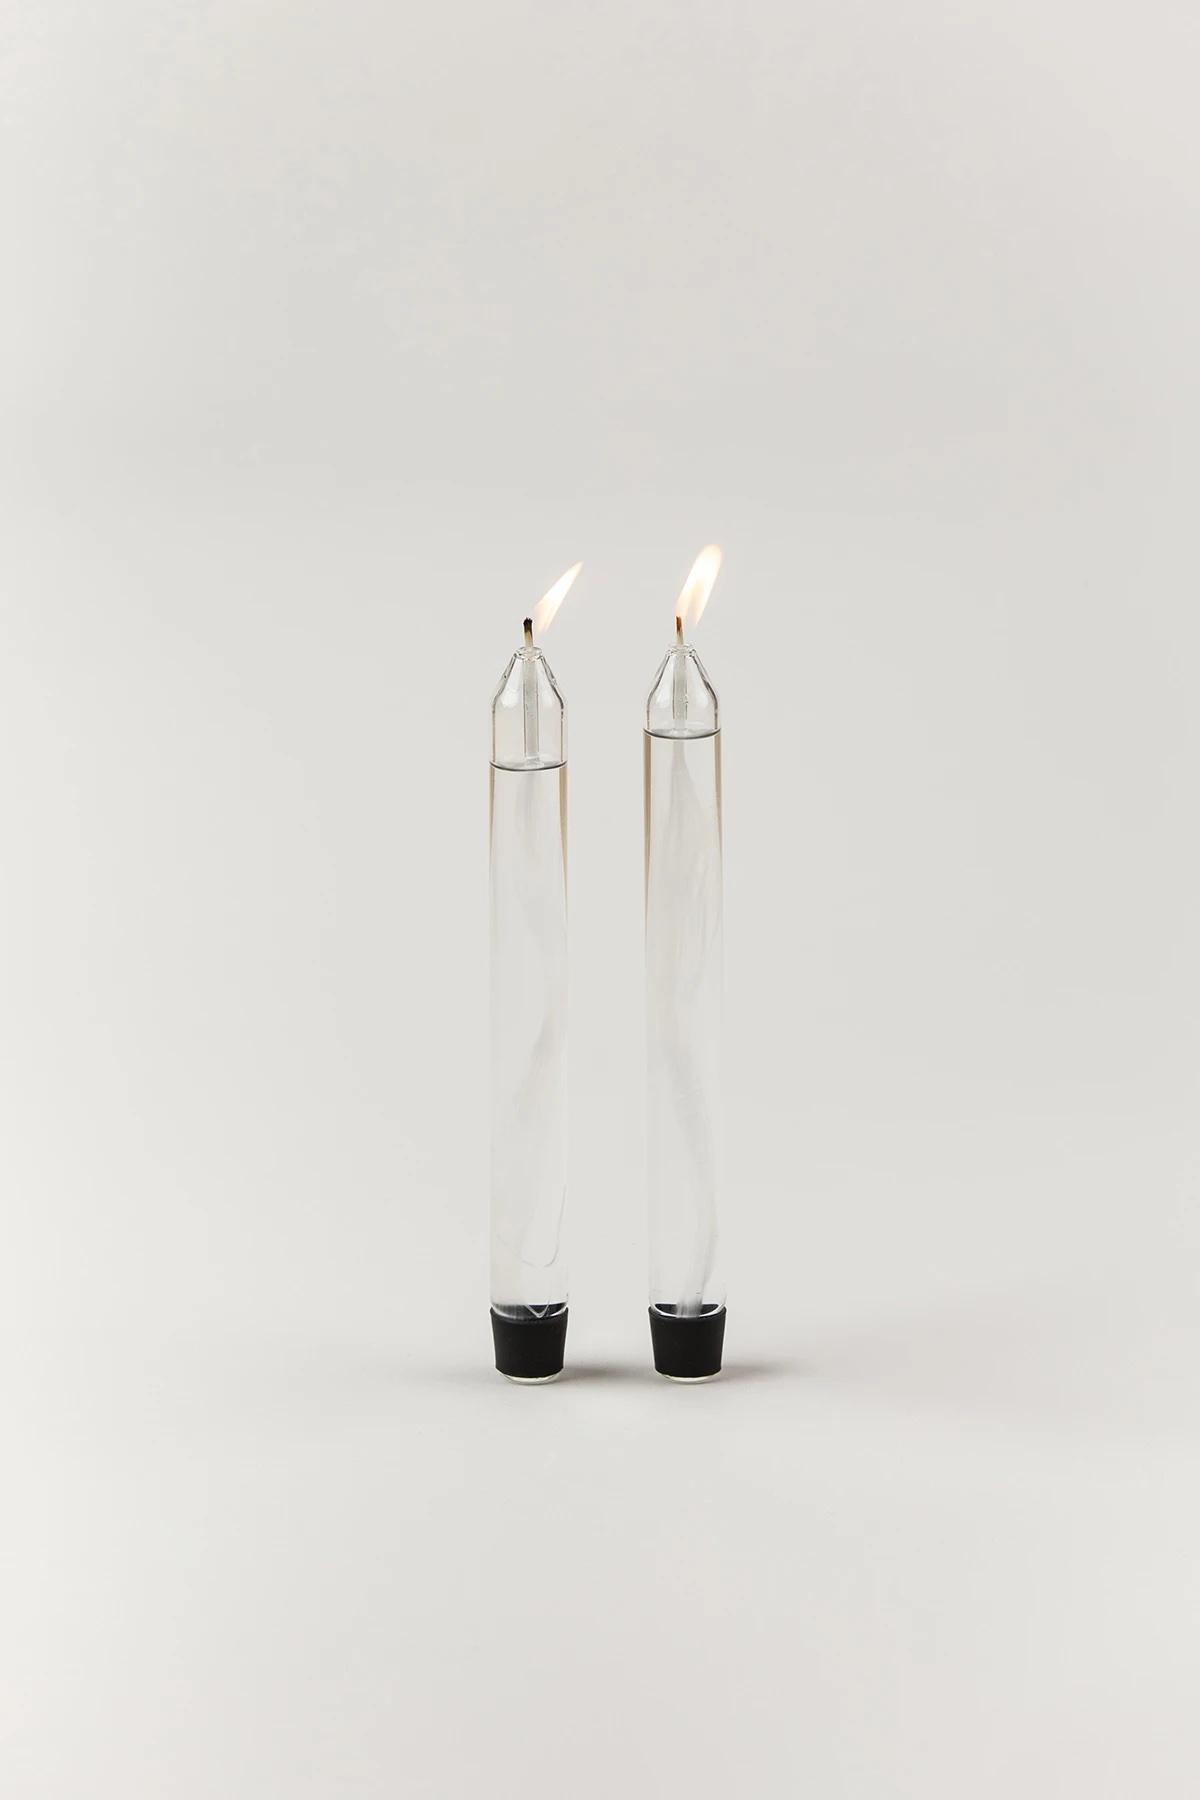 glaslys-olielys-transparent-studio-about